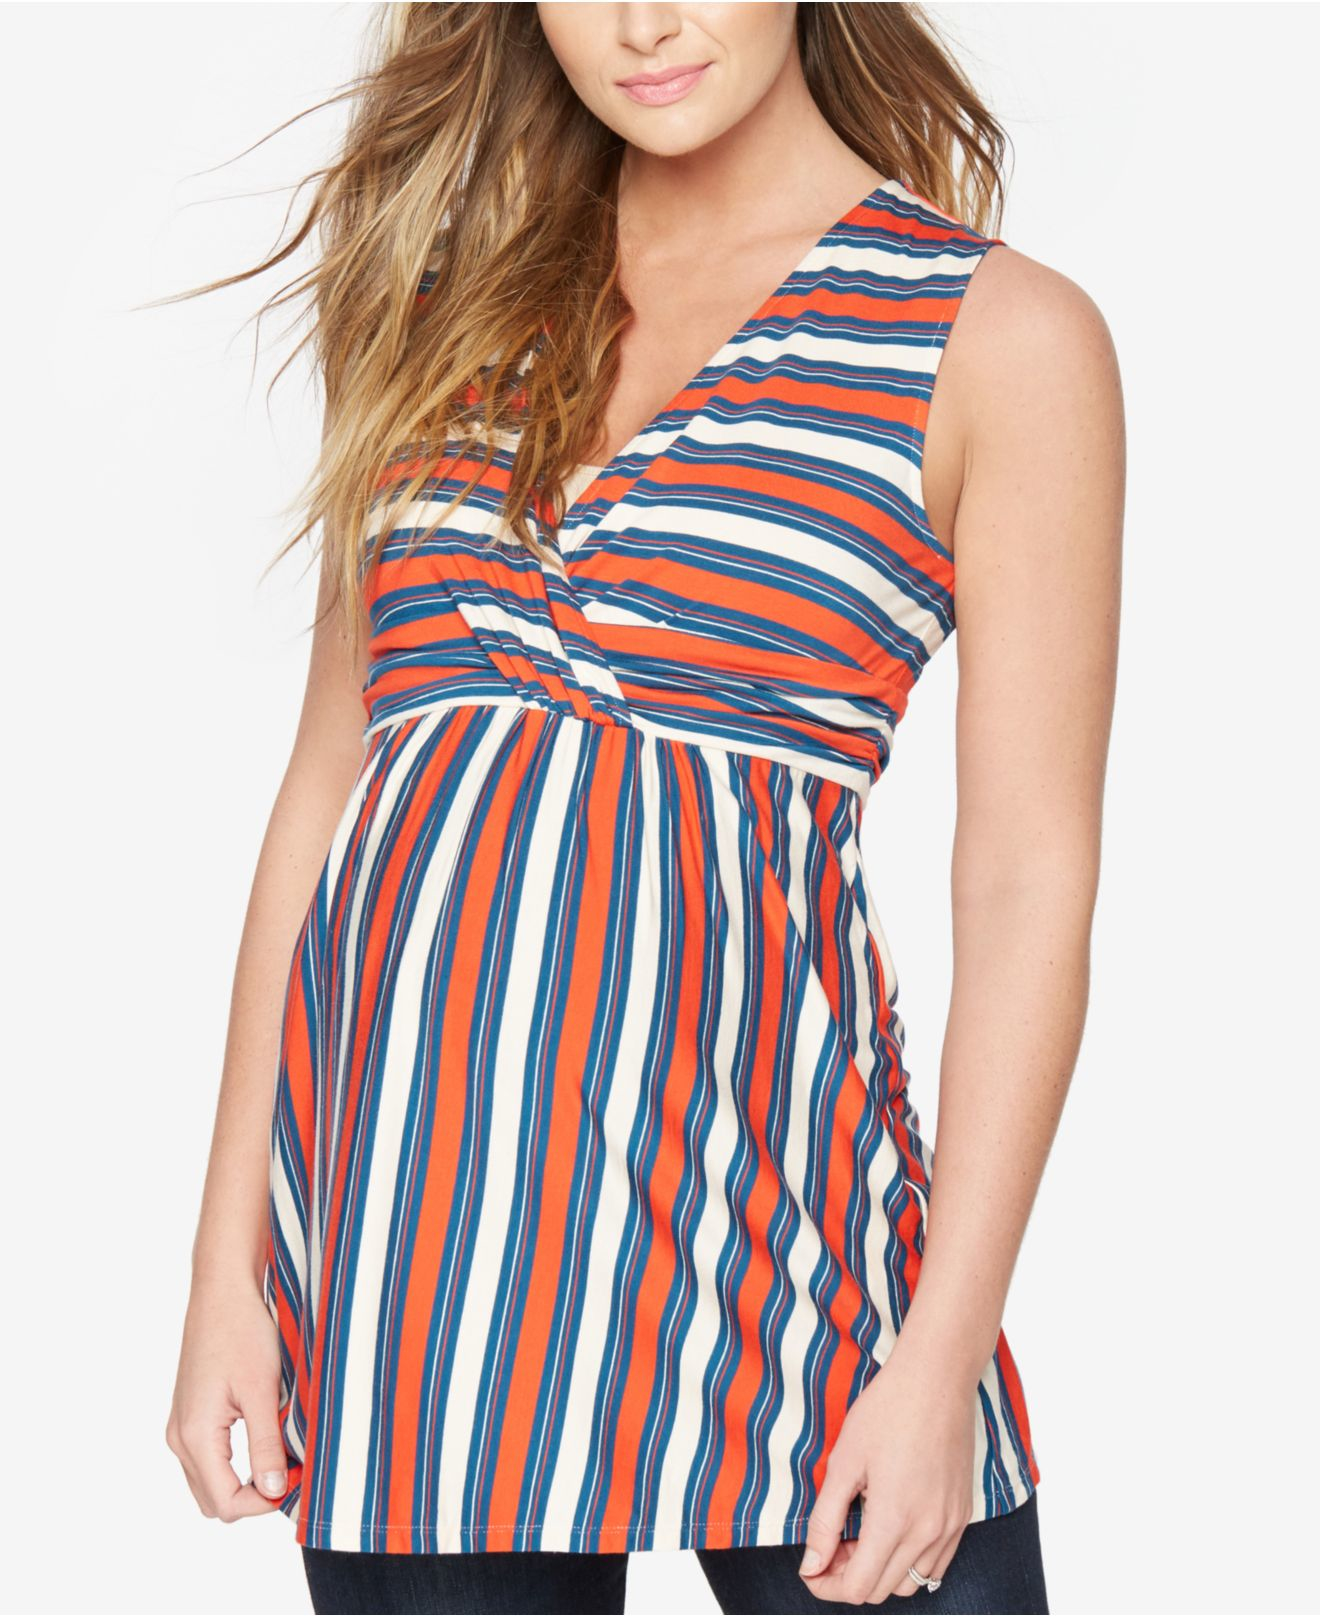 Rachel zoe Maternity Striped Sleeveless Top